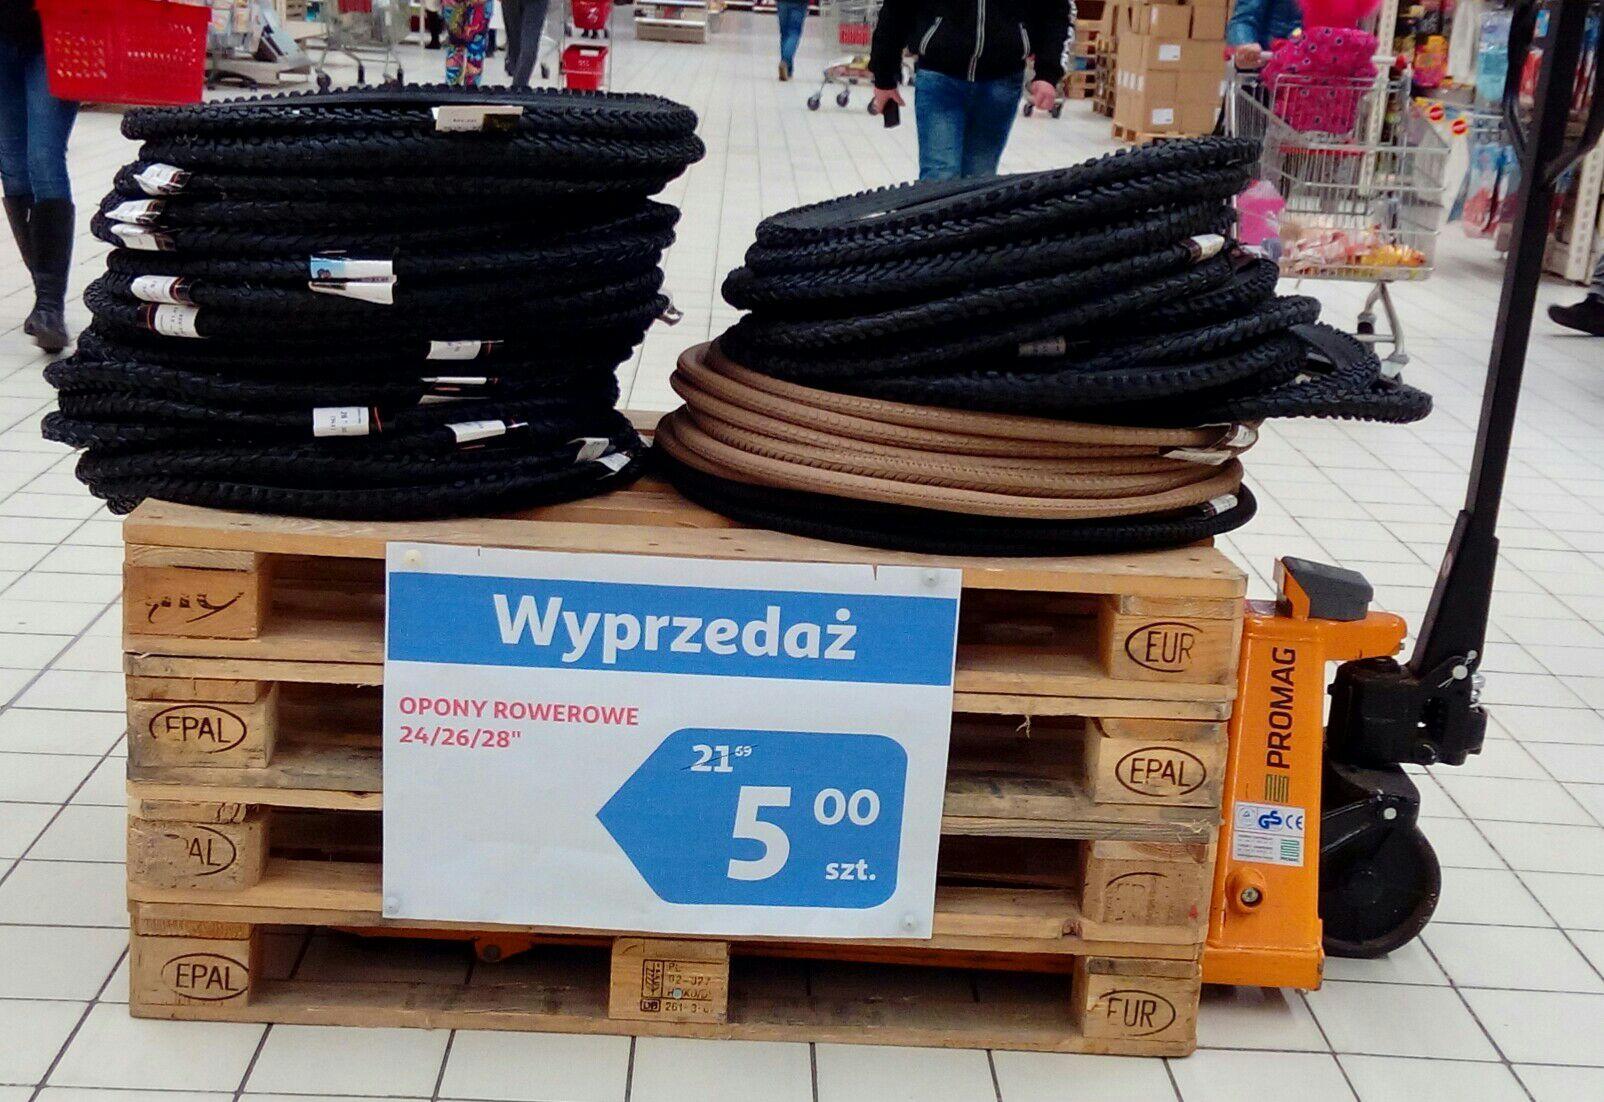 "Opony rowerowe 24""/26""/28"" - Auchan Katowice"